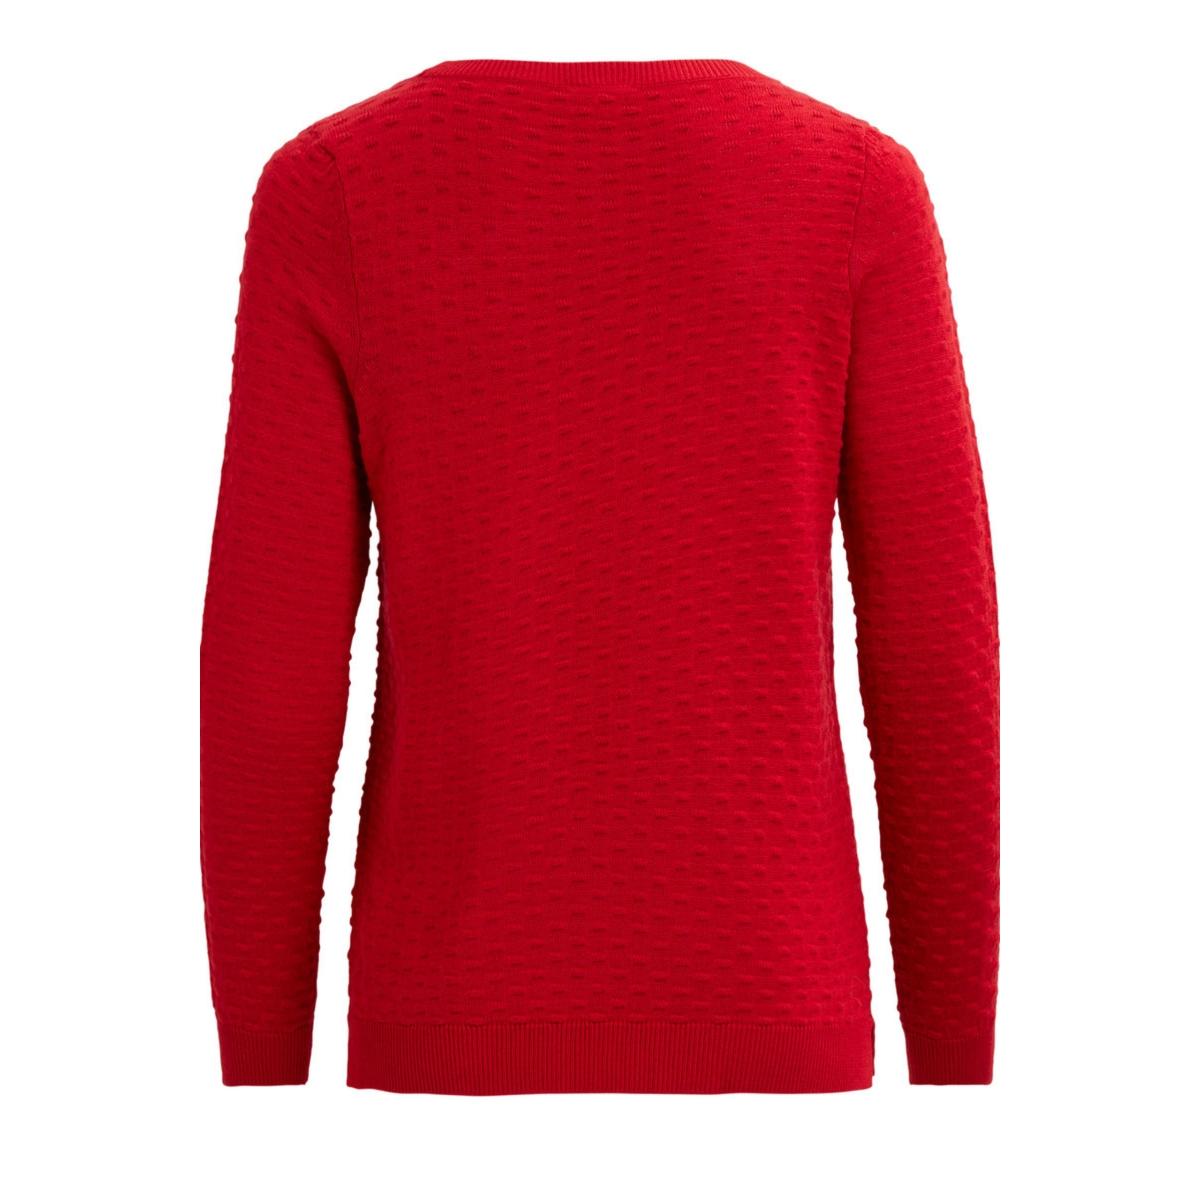 visarafina knit top - fav 14045222 vila trui lollipop